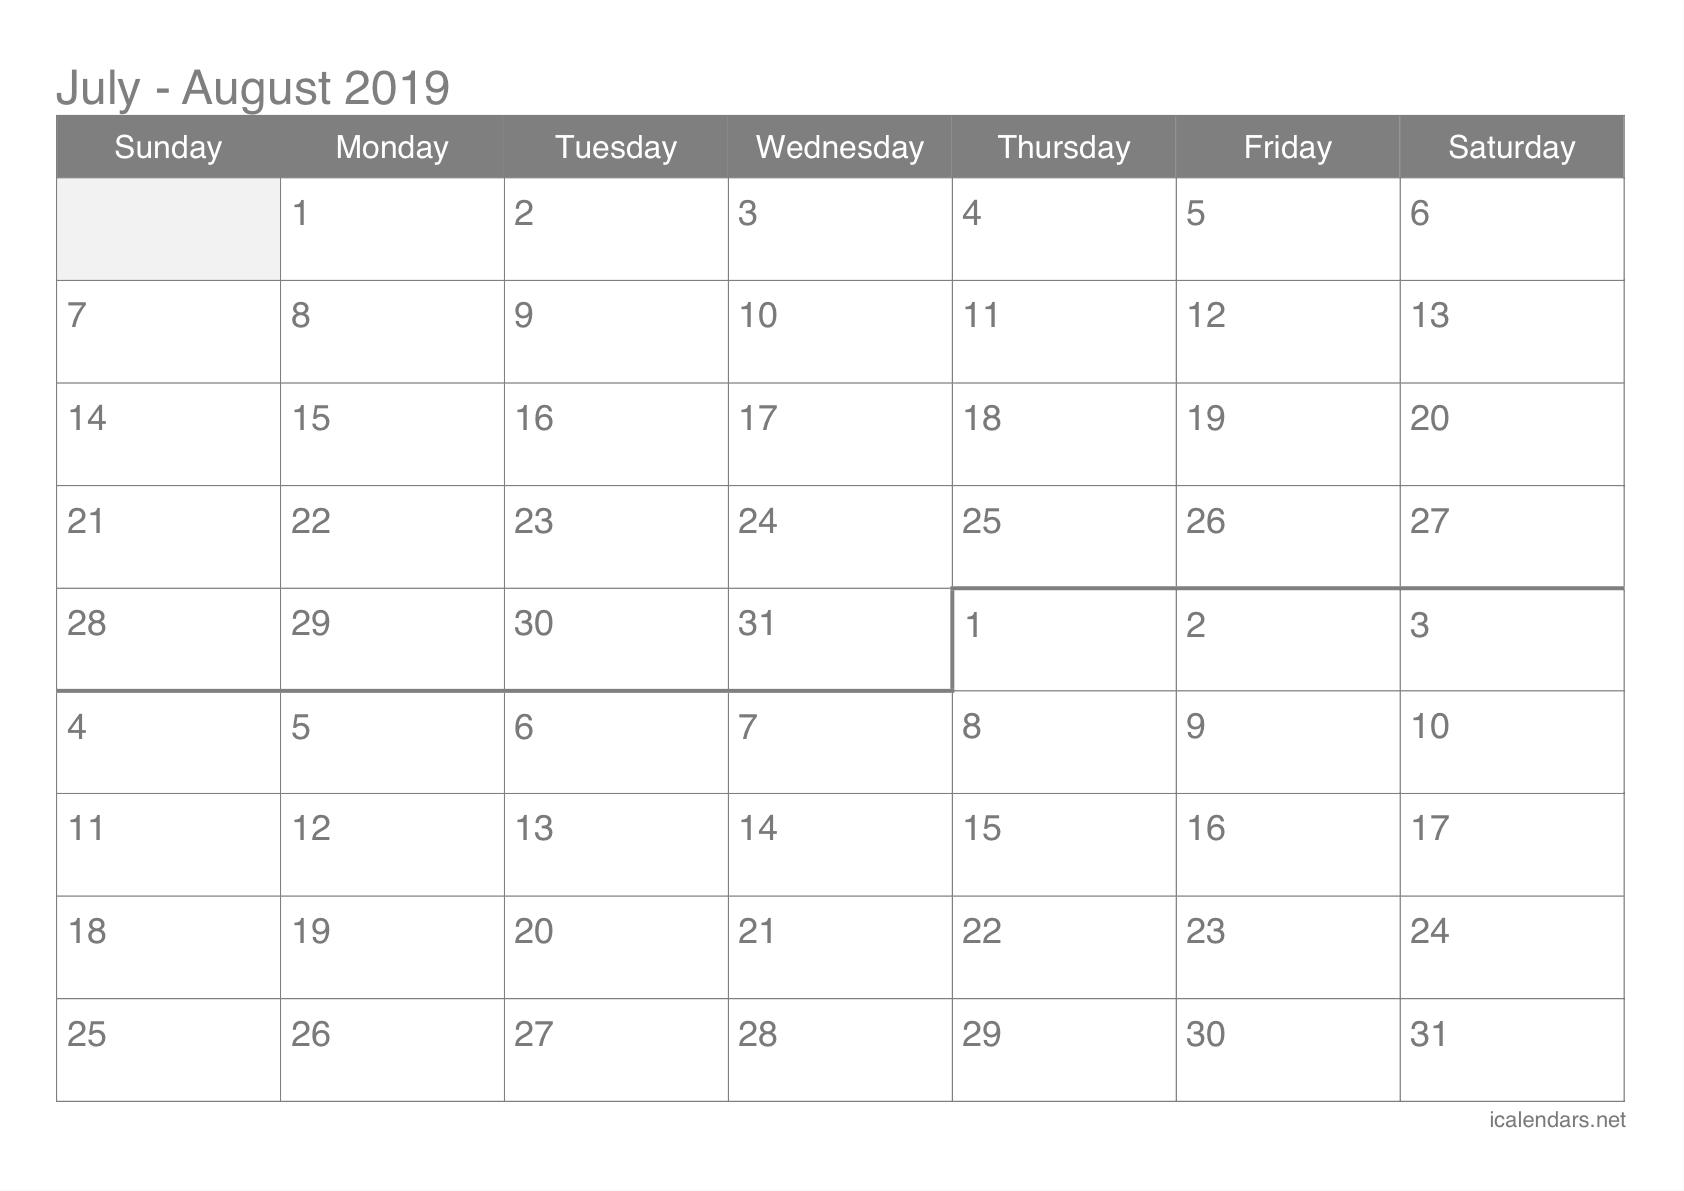 July And August 2019 Printable Calendar - Icalendars Calendar Of 2019 July